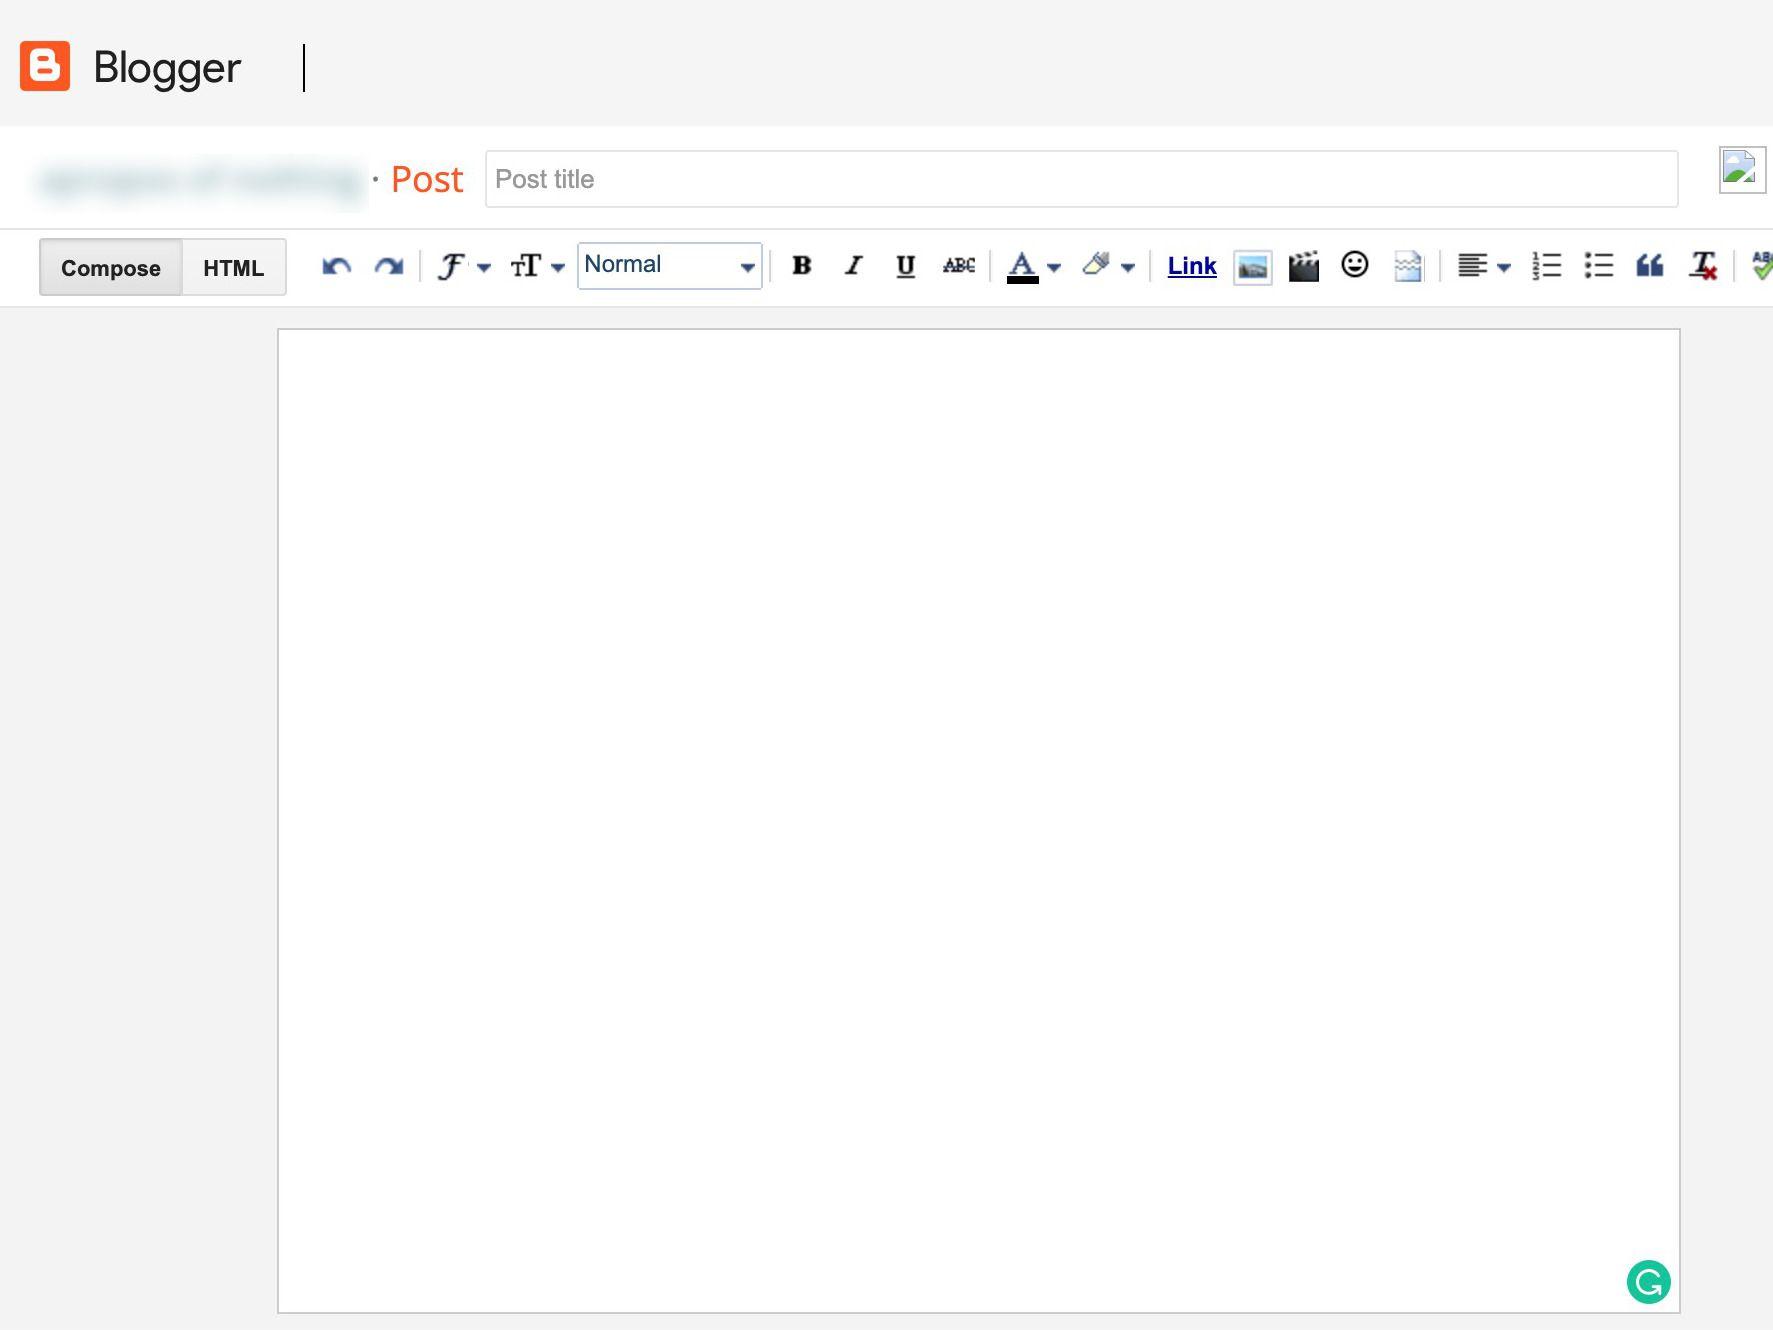 Blogger's Compose window